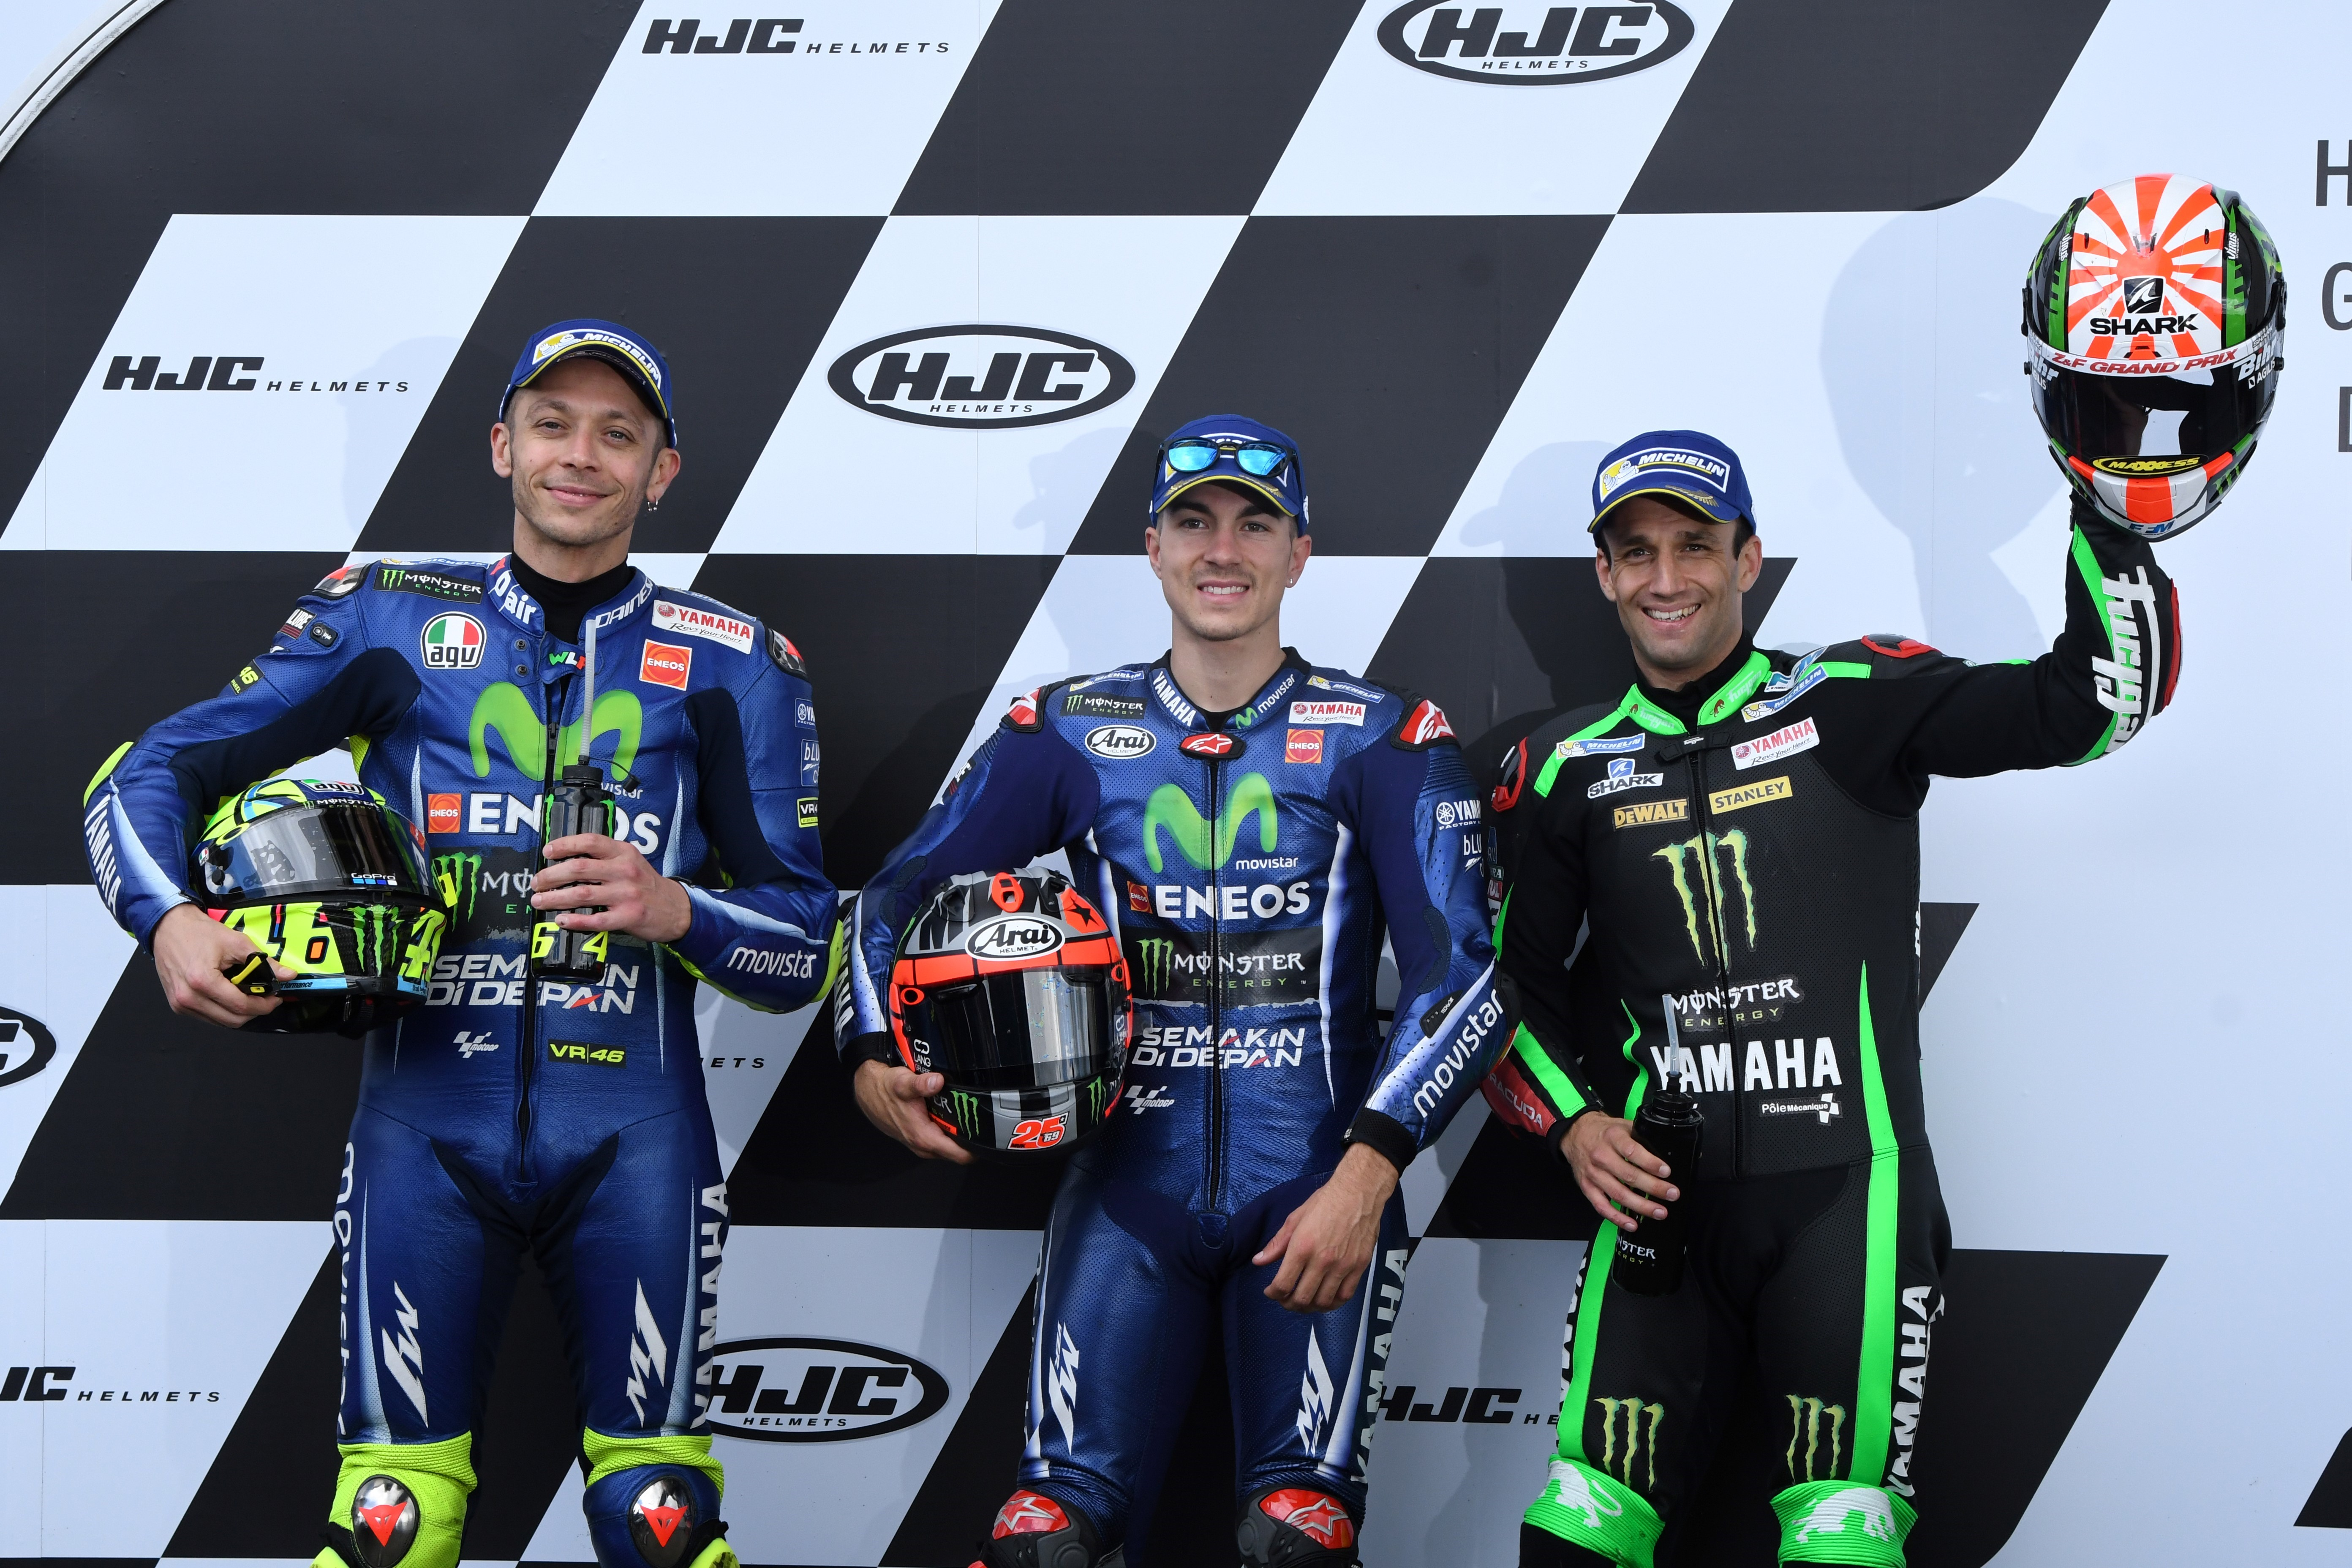 Valentino Rossi, Maverick Viñales (Yamaha Factory) et Johann Zarco (Yamaha Tech3) après la qualification du Grand Prix de France 2017